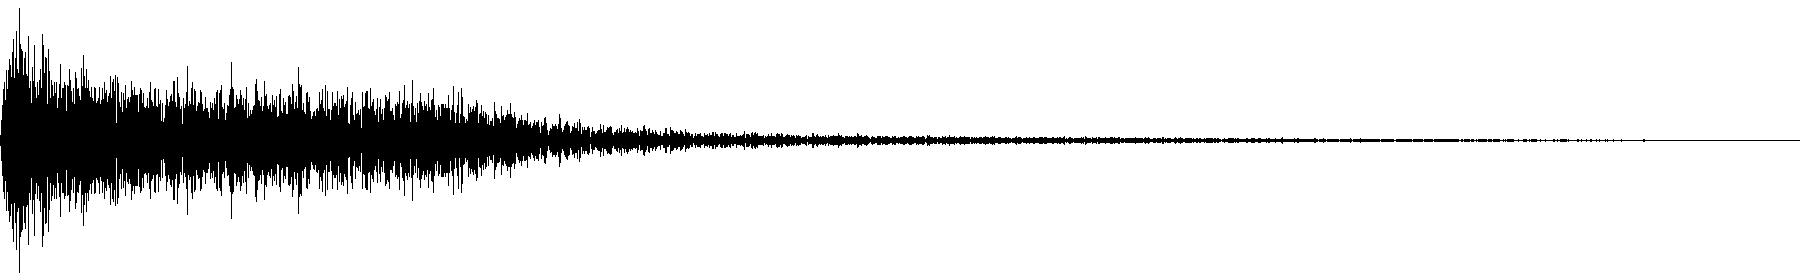 vedh synth cut 235 gm9